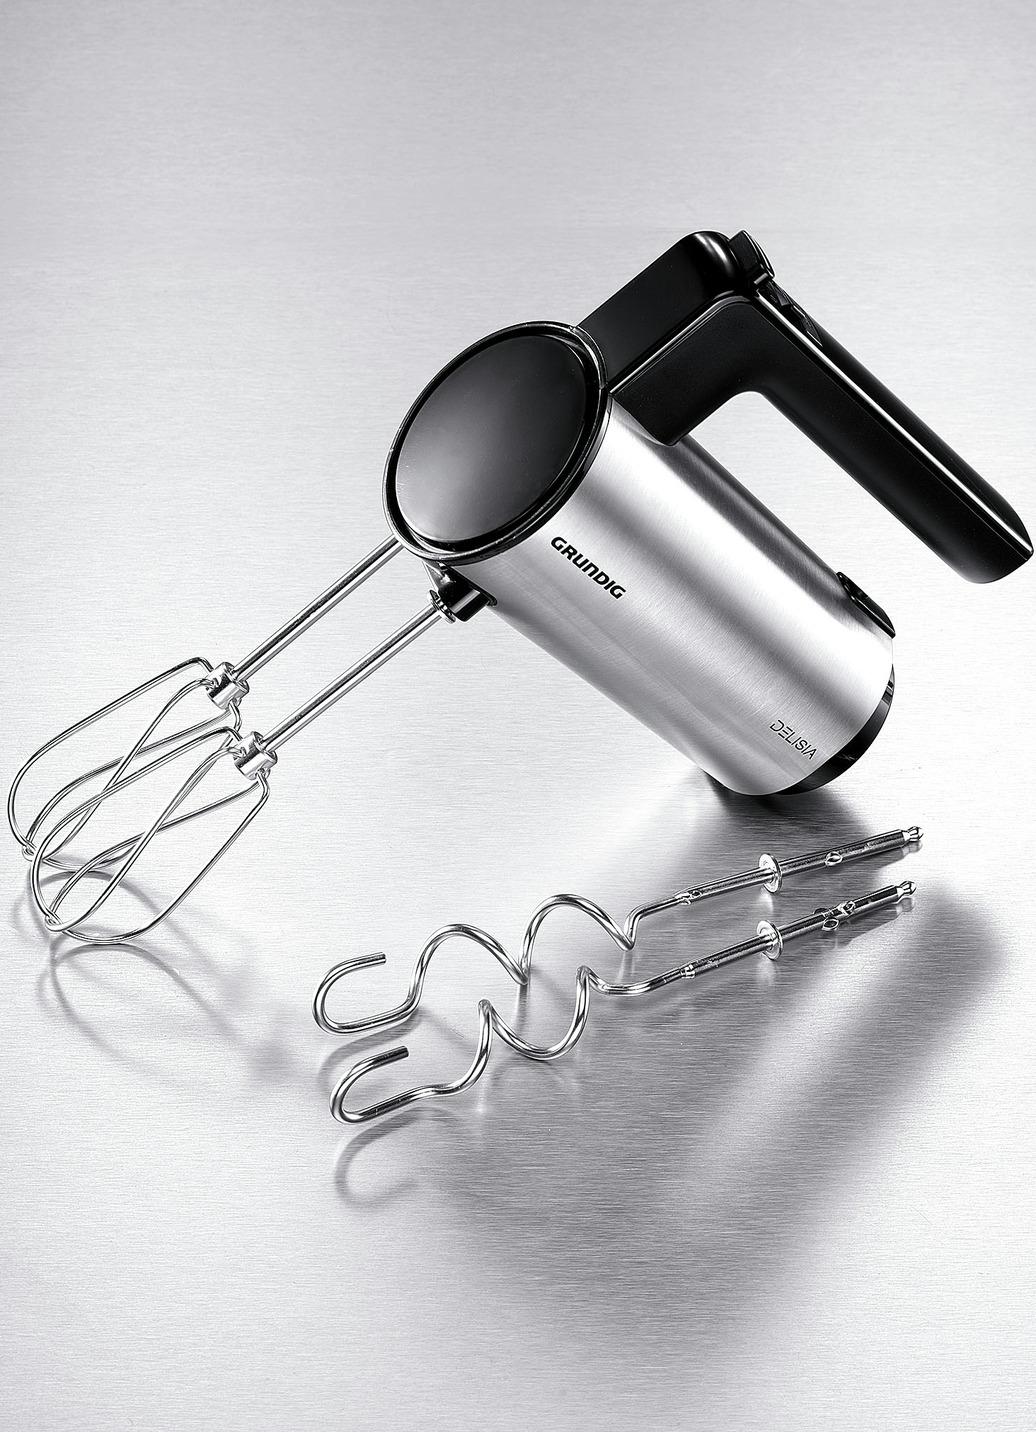 Rührgerät Handmixer Mixer Handrührgerät Küchenmaschine Grundig HM7680 Edelstahl